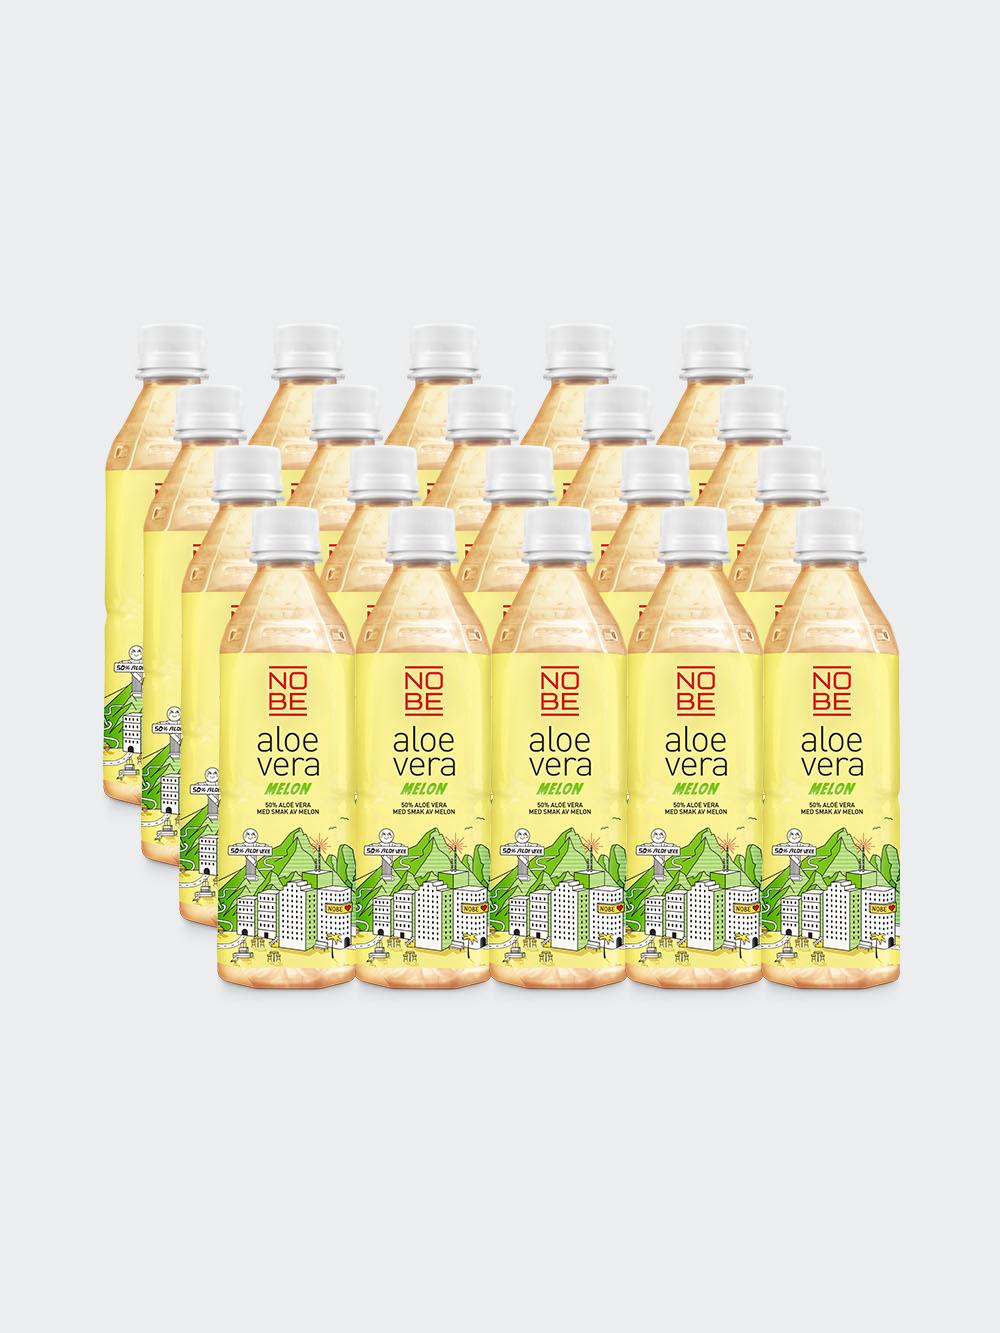 NOBE Aloe Vera – Melon 20-pack